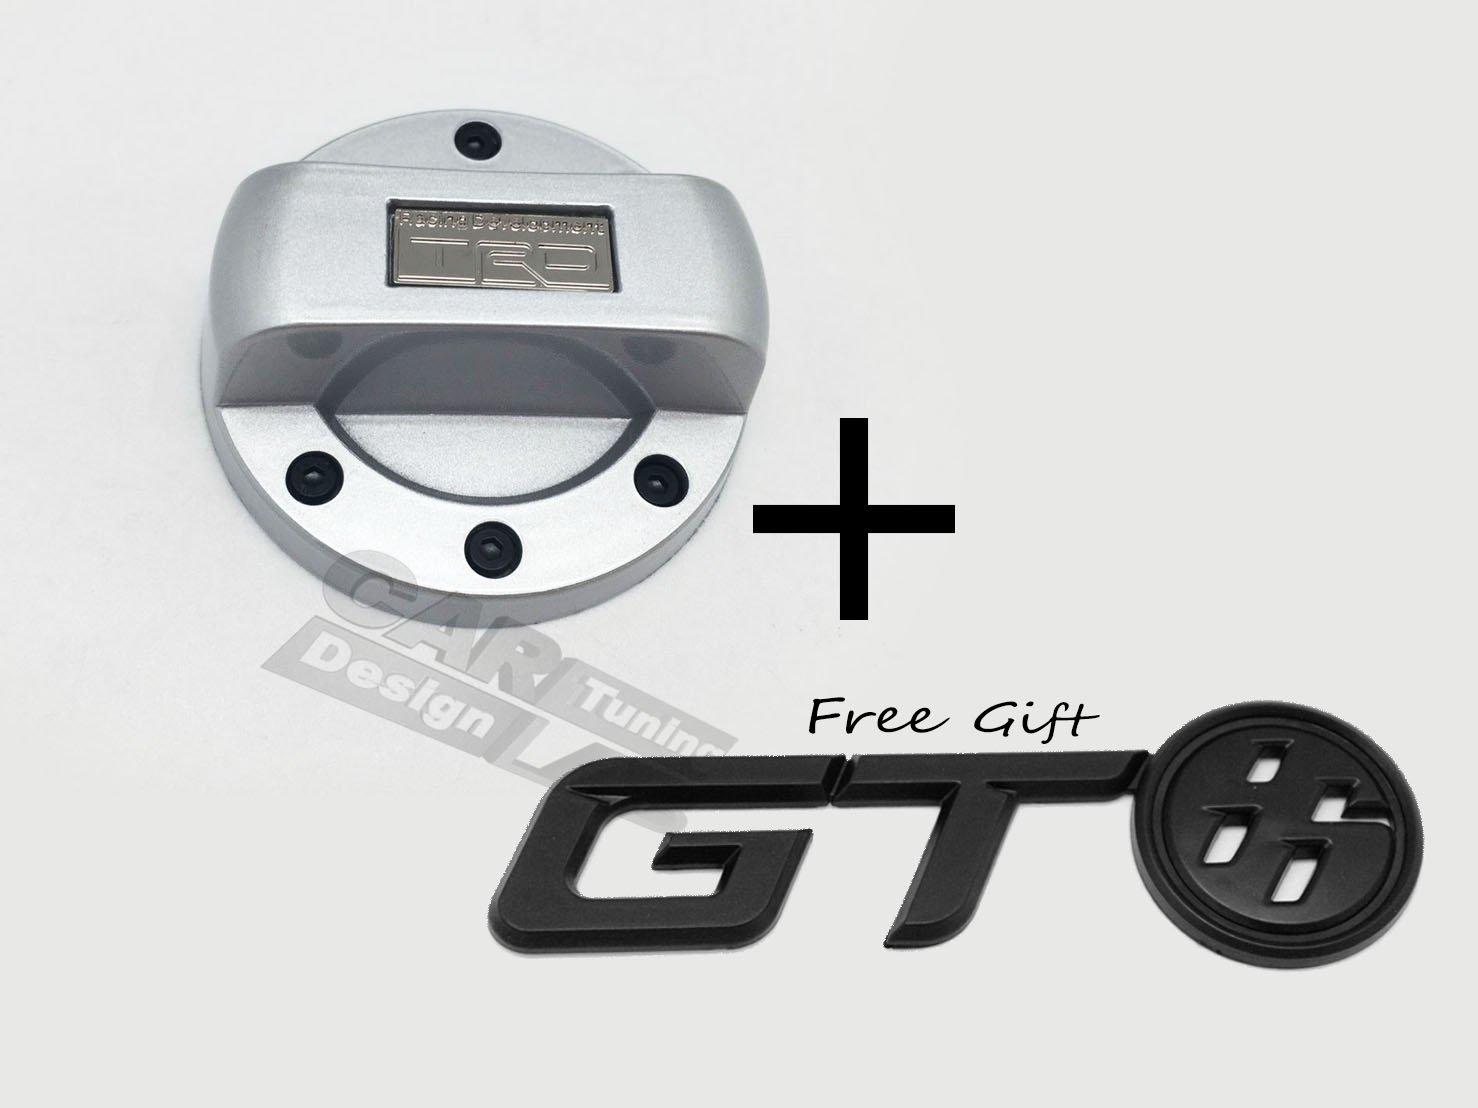 (2) JDM TRD Gas Fuel Cap Lid Cover Overlay + Gift GT86 Emblem For SCION FRS FR-S SUBARU BRZ Toyota GT86 CAR LAB